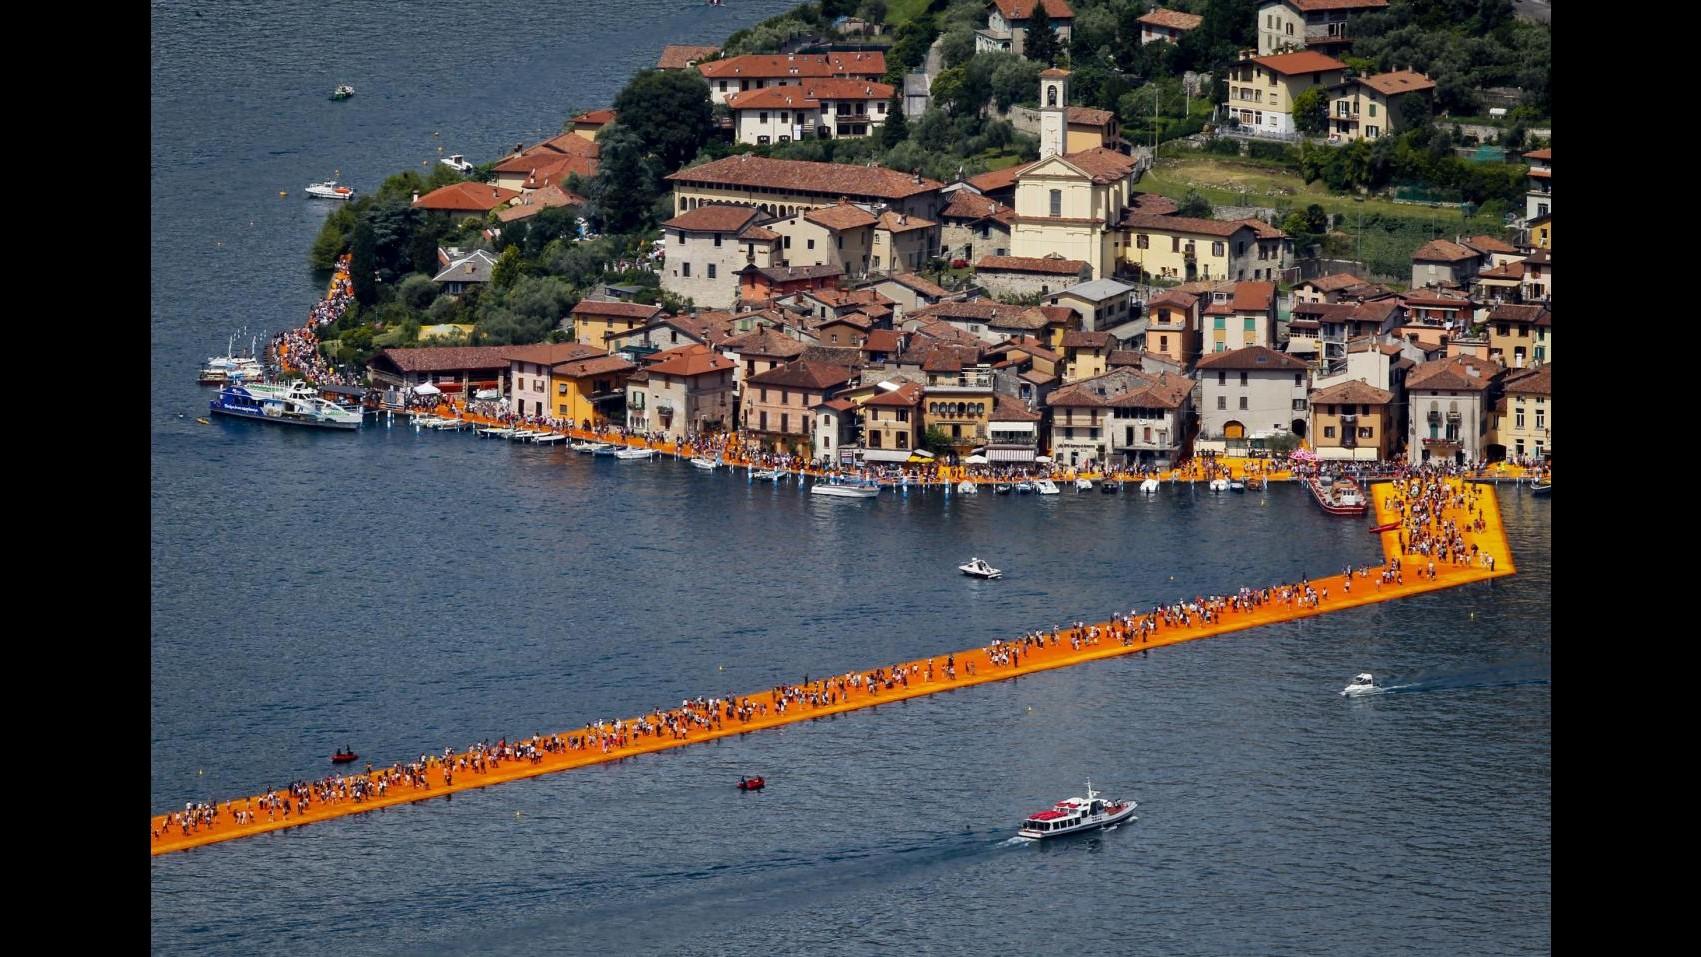 The Floating Piers, l'opera di Christo sul lago d'Iseo